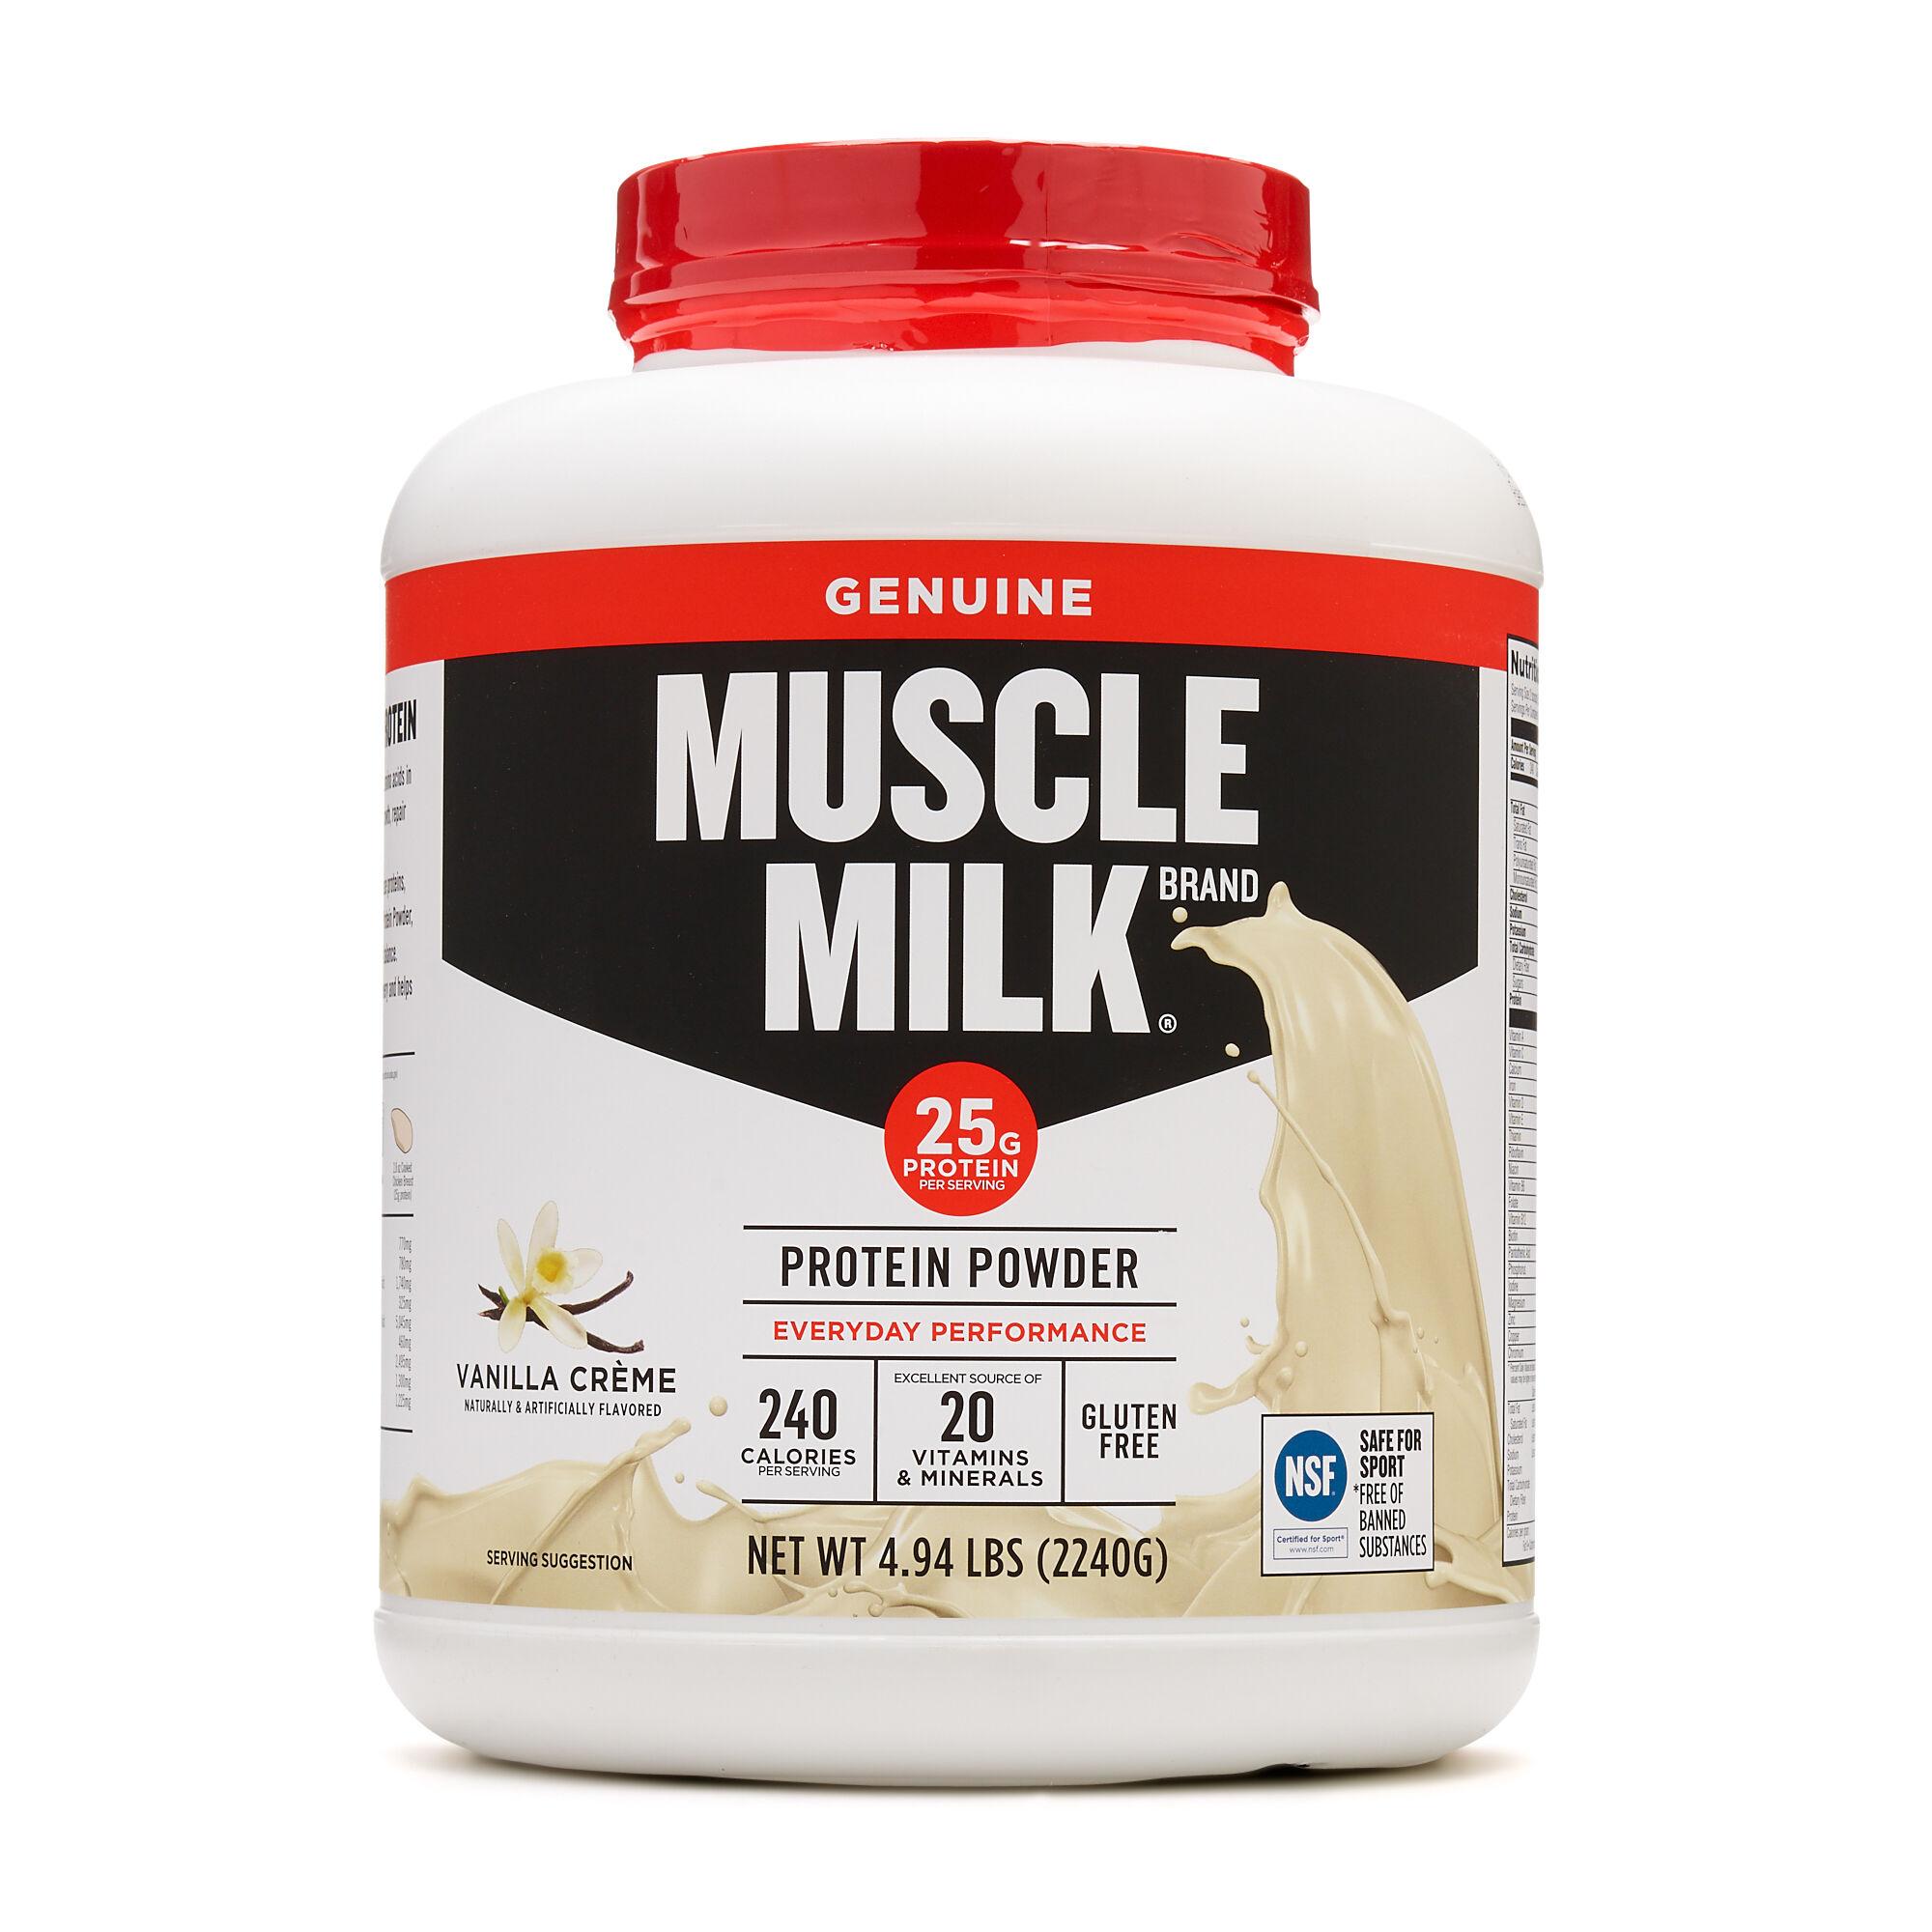 proteina para bajar de peso gnc vitaminse